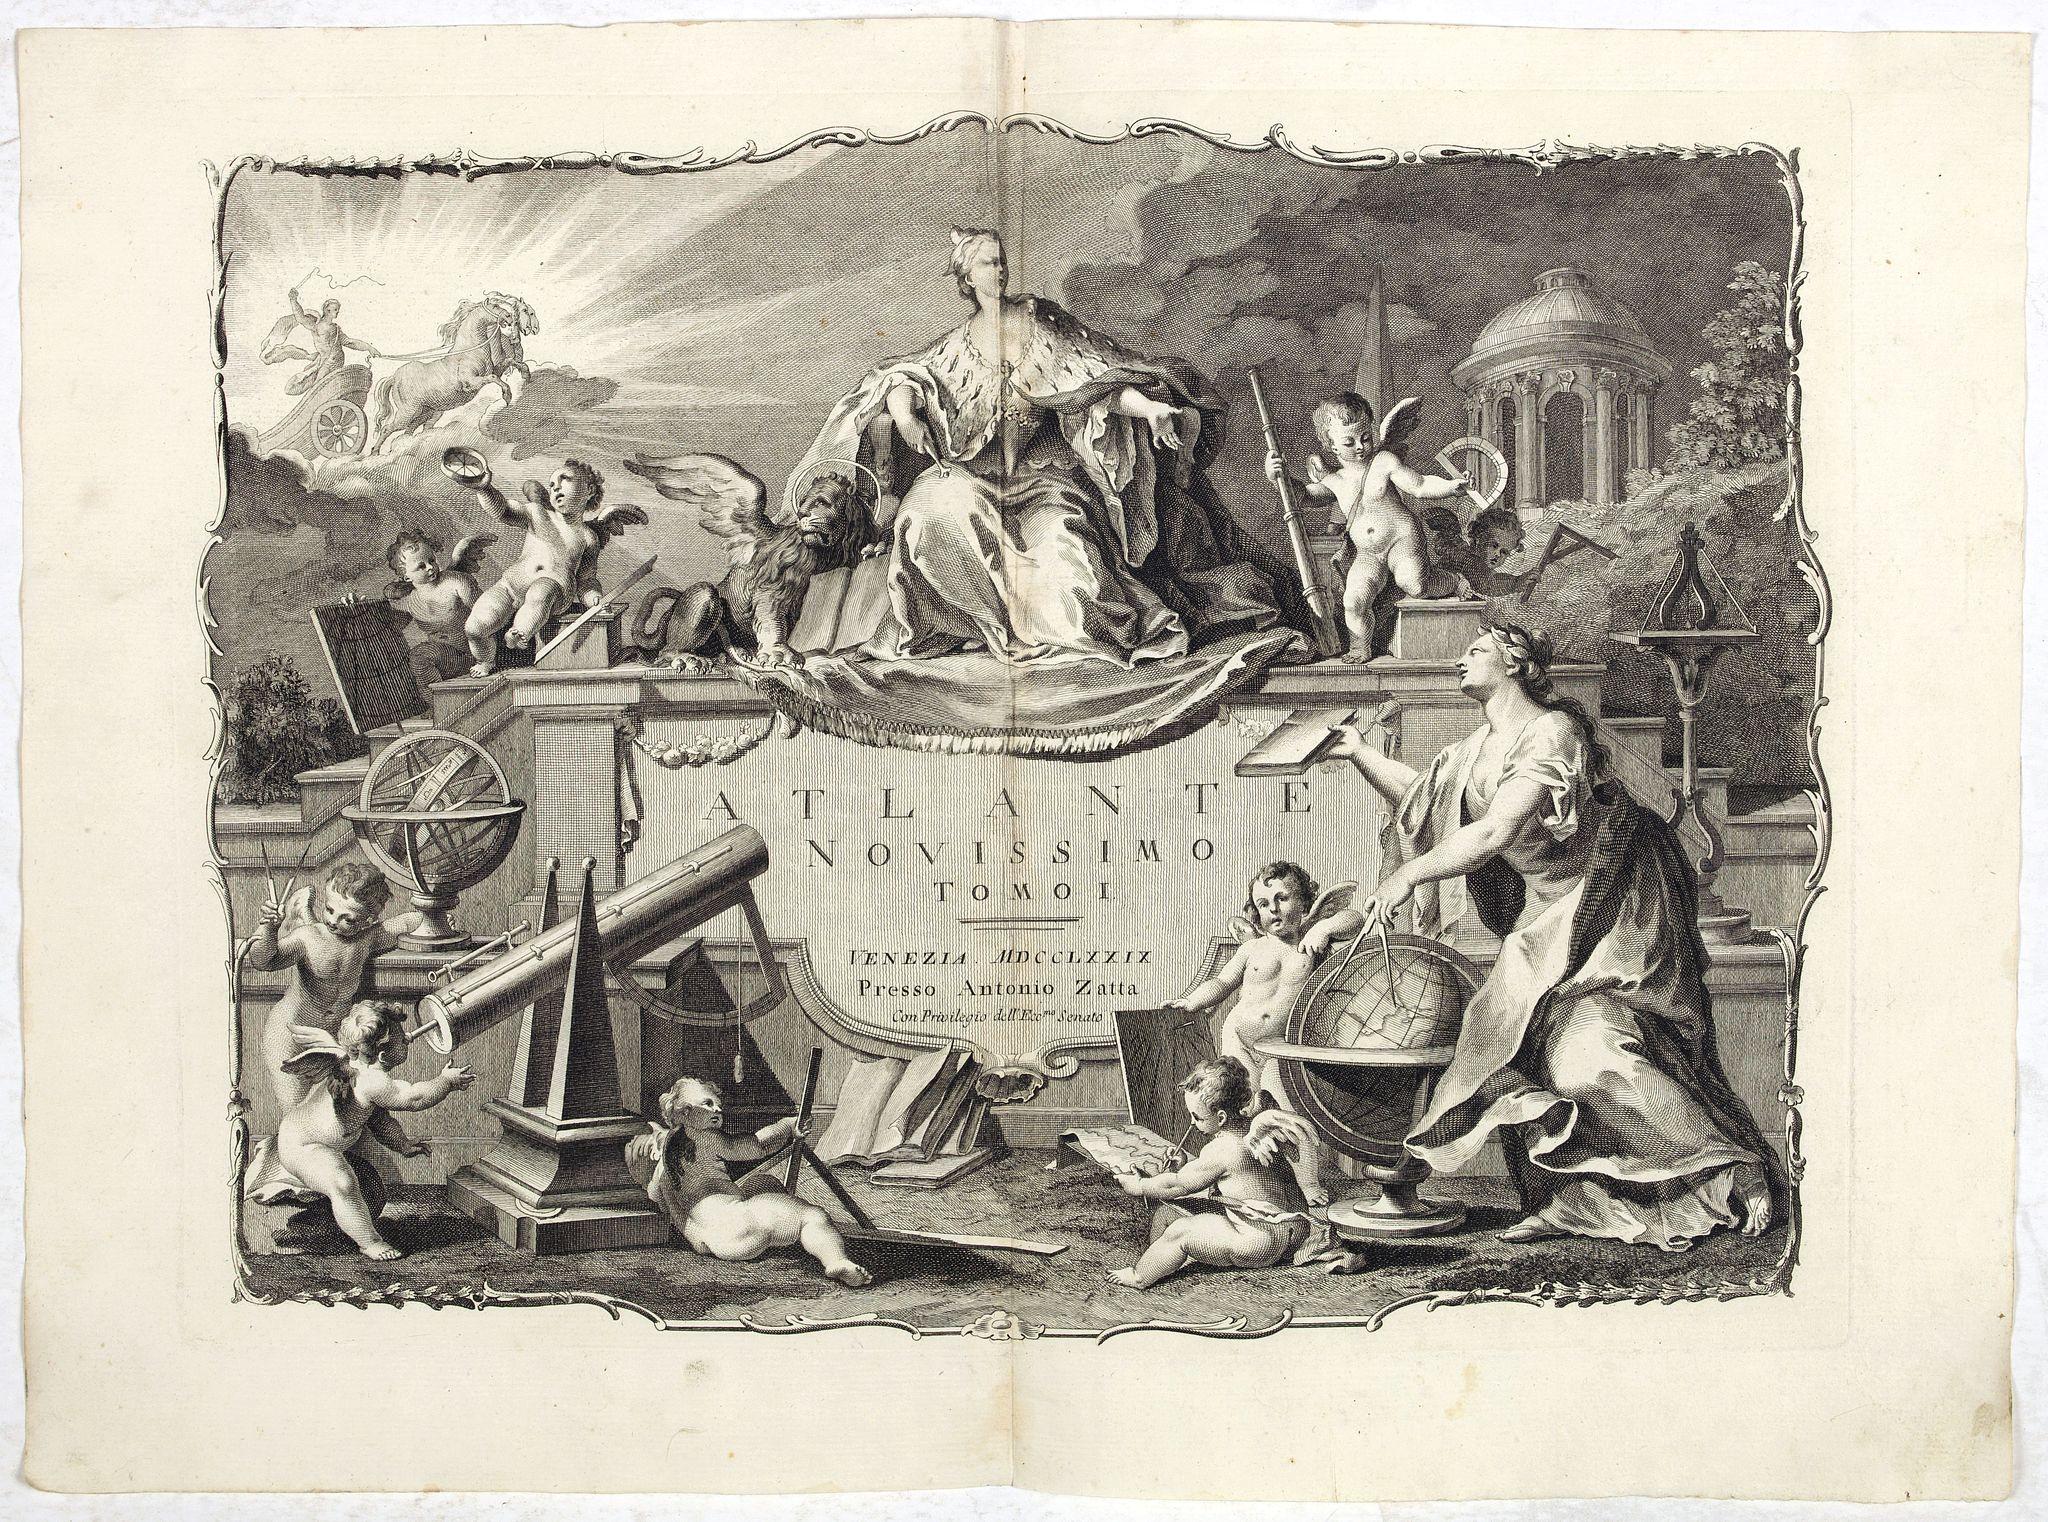 ZATTA, A. -  [Title page] Atlante Novissimo, Tomo I . . .